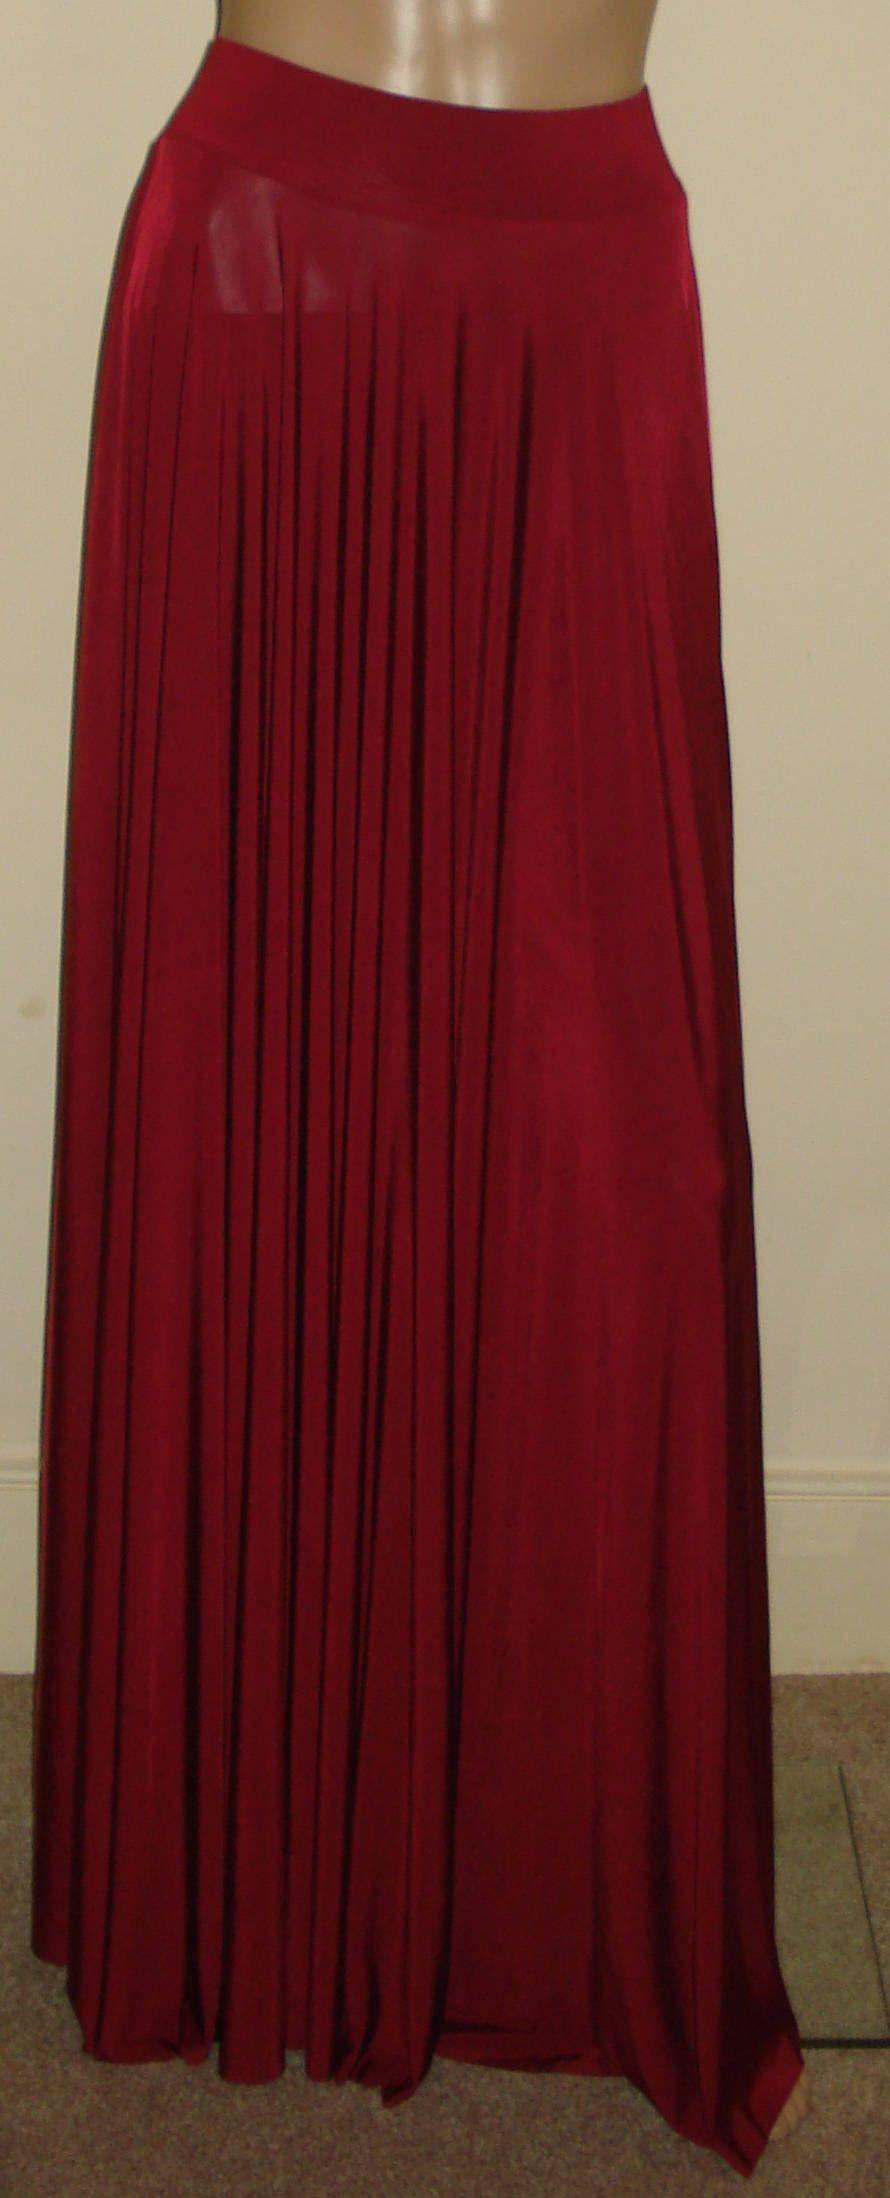 crochet see length floors floor products skirts zooomberg trim through skirt